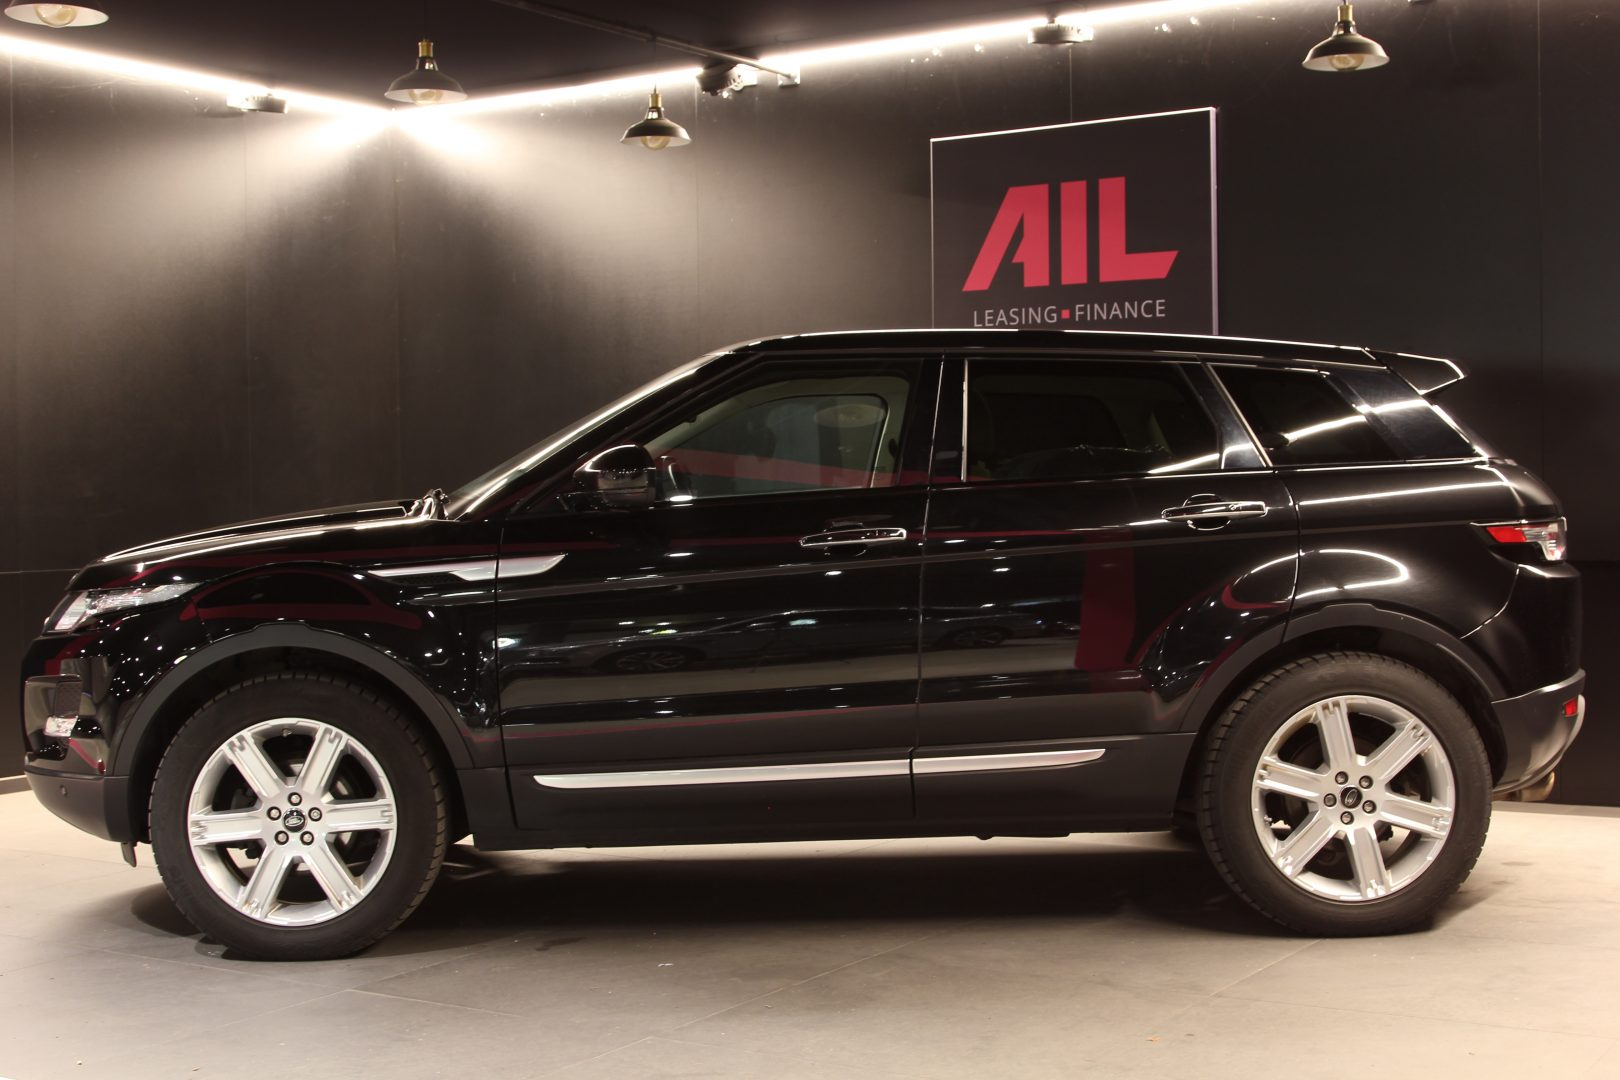 AIL Land Rover Range Rover Evoque Prestige 1